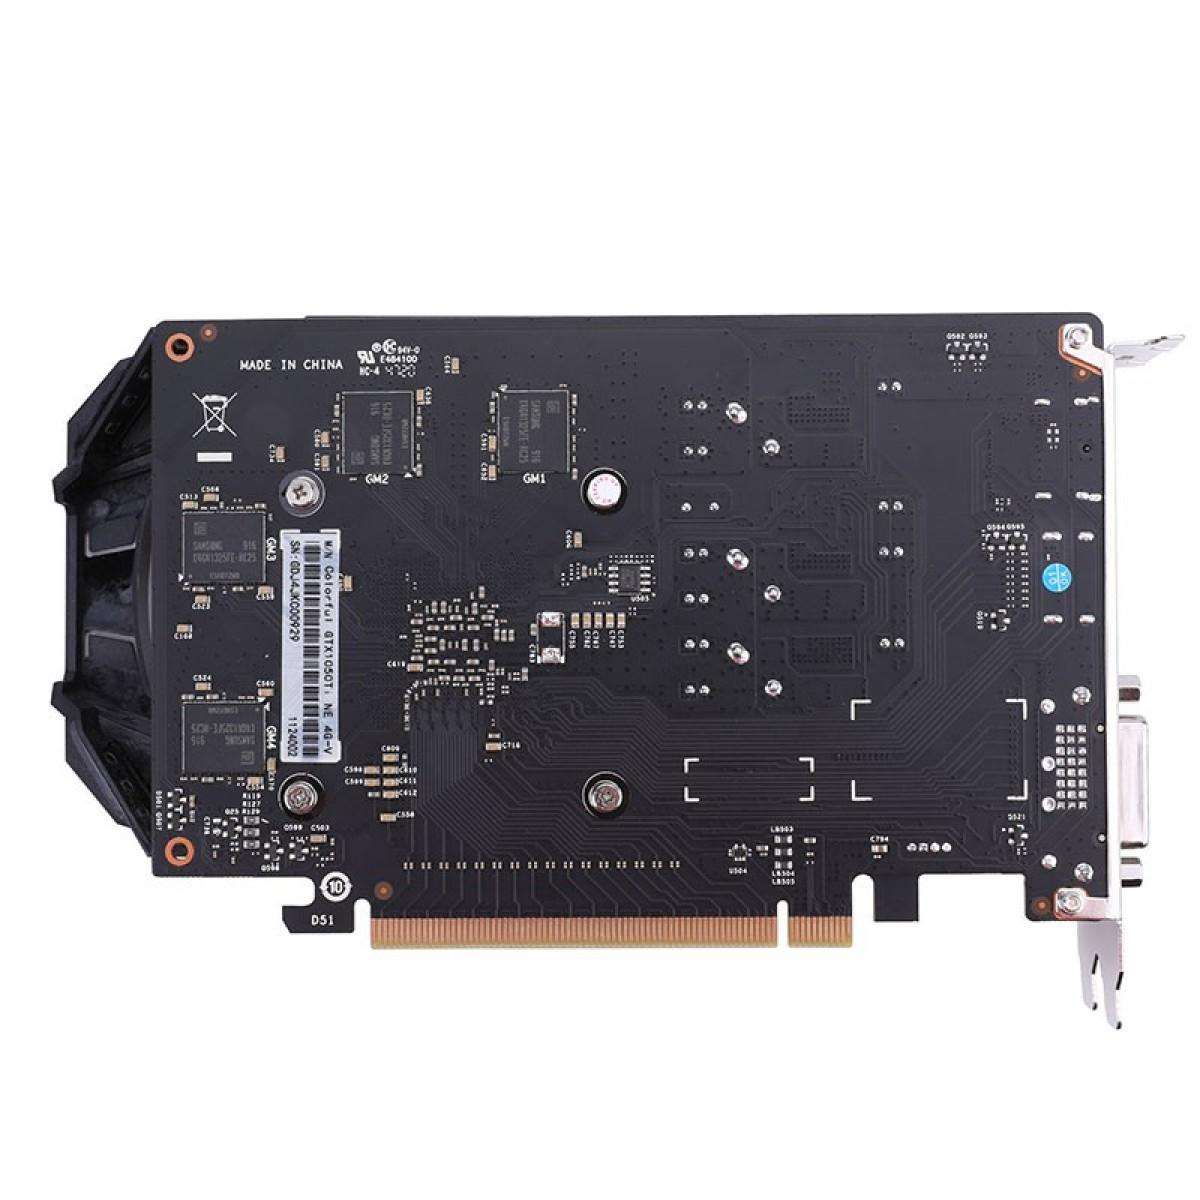 Placa de Vídeo Colorful NVIDIA GeForce GTX 1050 Ti, 4GB, GDDR5, 128bit, 212327100844